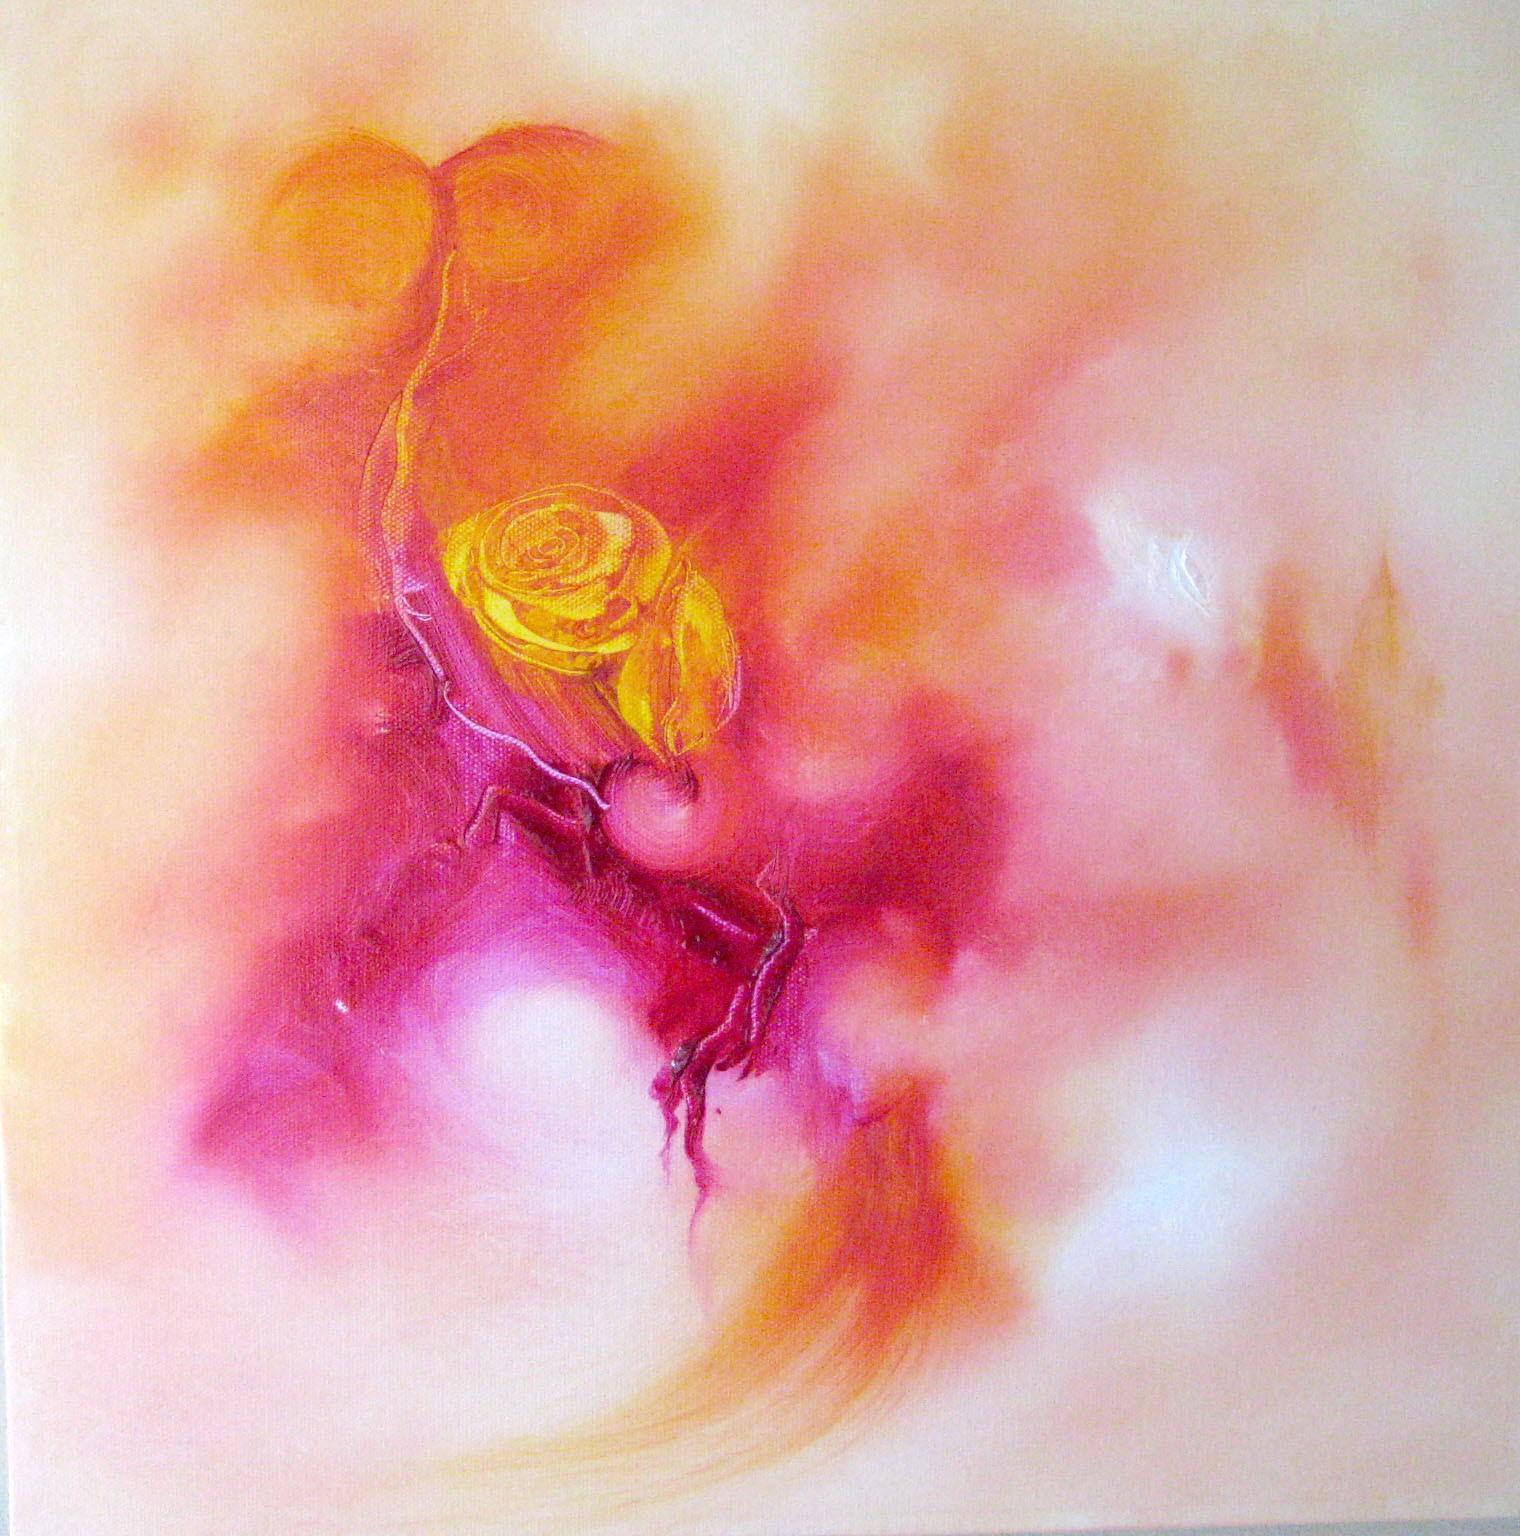 Pink roses, oilpaintning with golden tones, abtrakt motive - aiva- jacqueline.ostrowski.spirituelart.dk